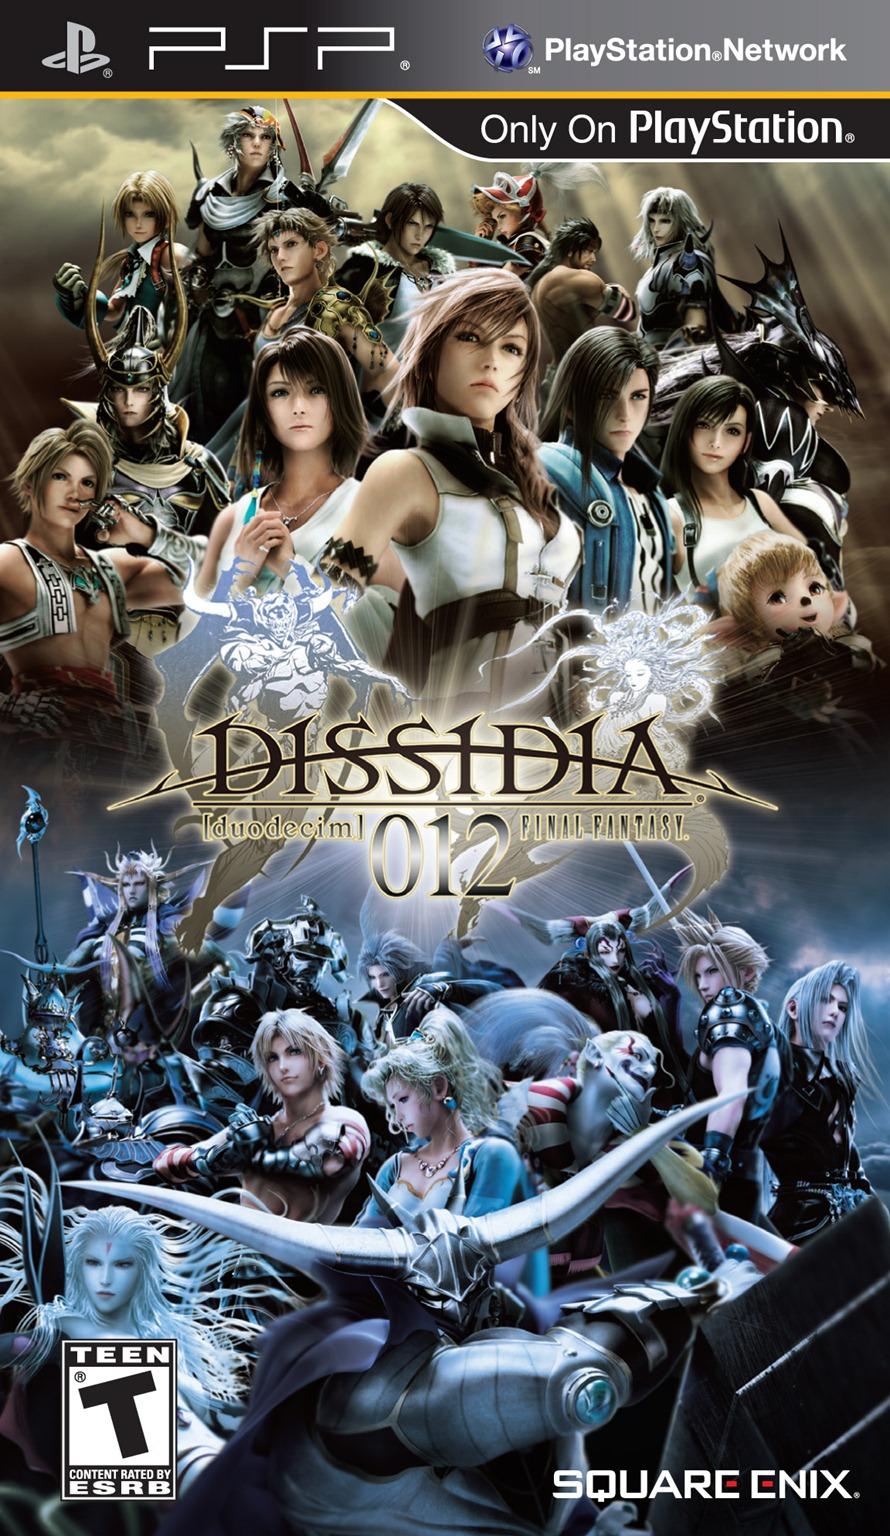 Dissidia 012[duodecim]: Final Fantasy's Box Art Is A Bit Busy - Siliconera